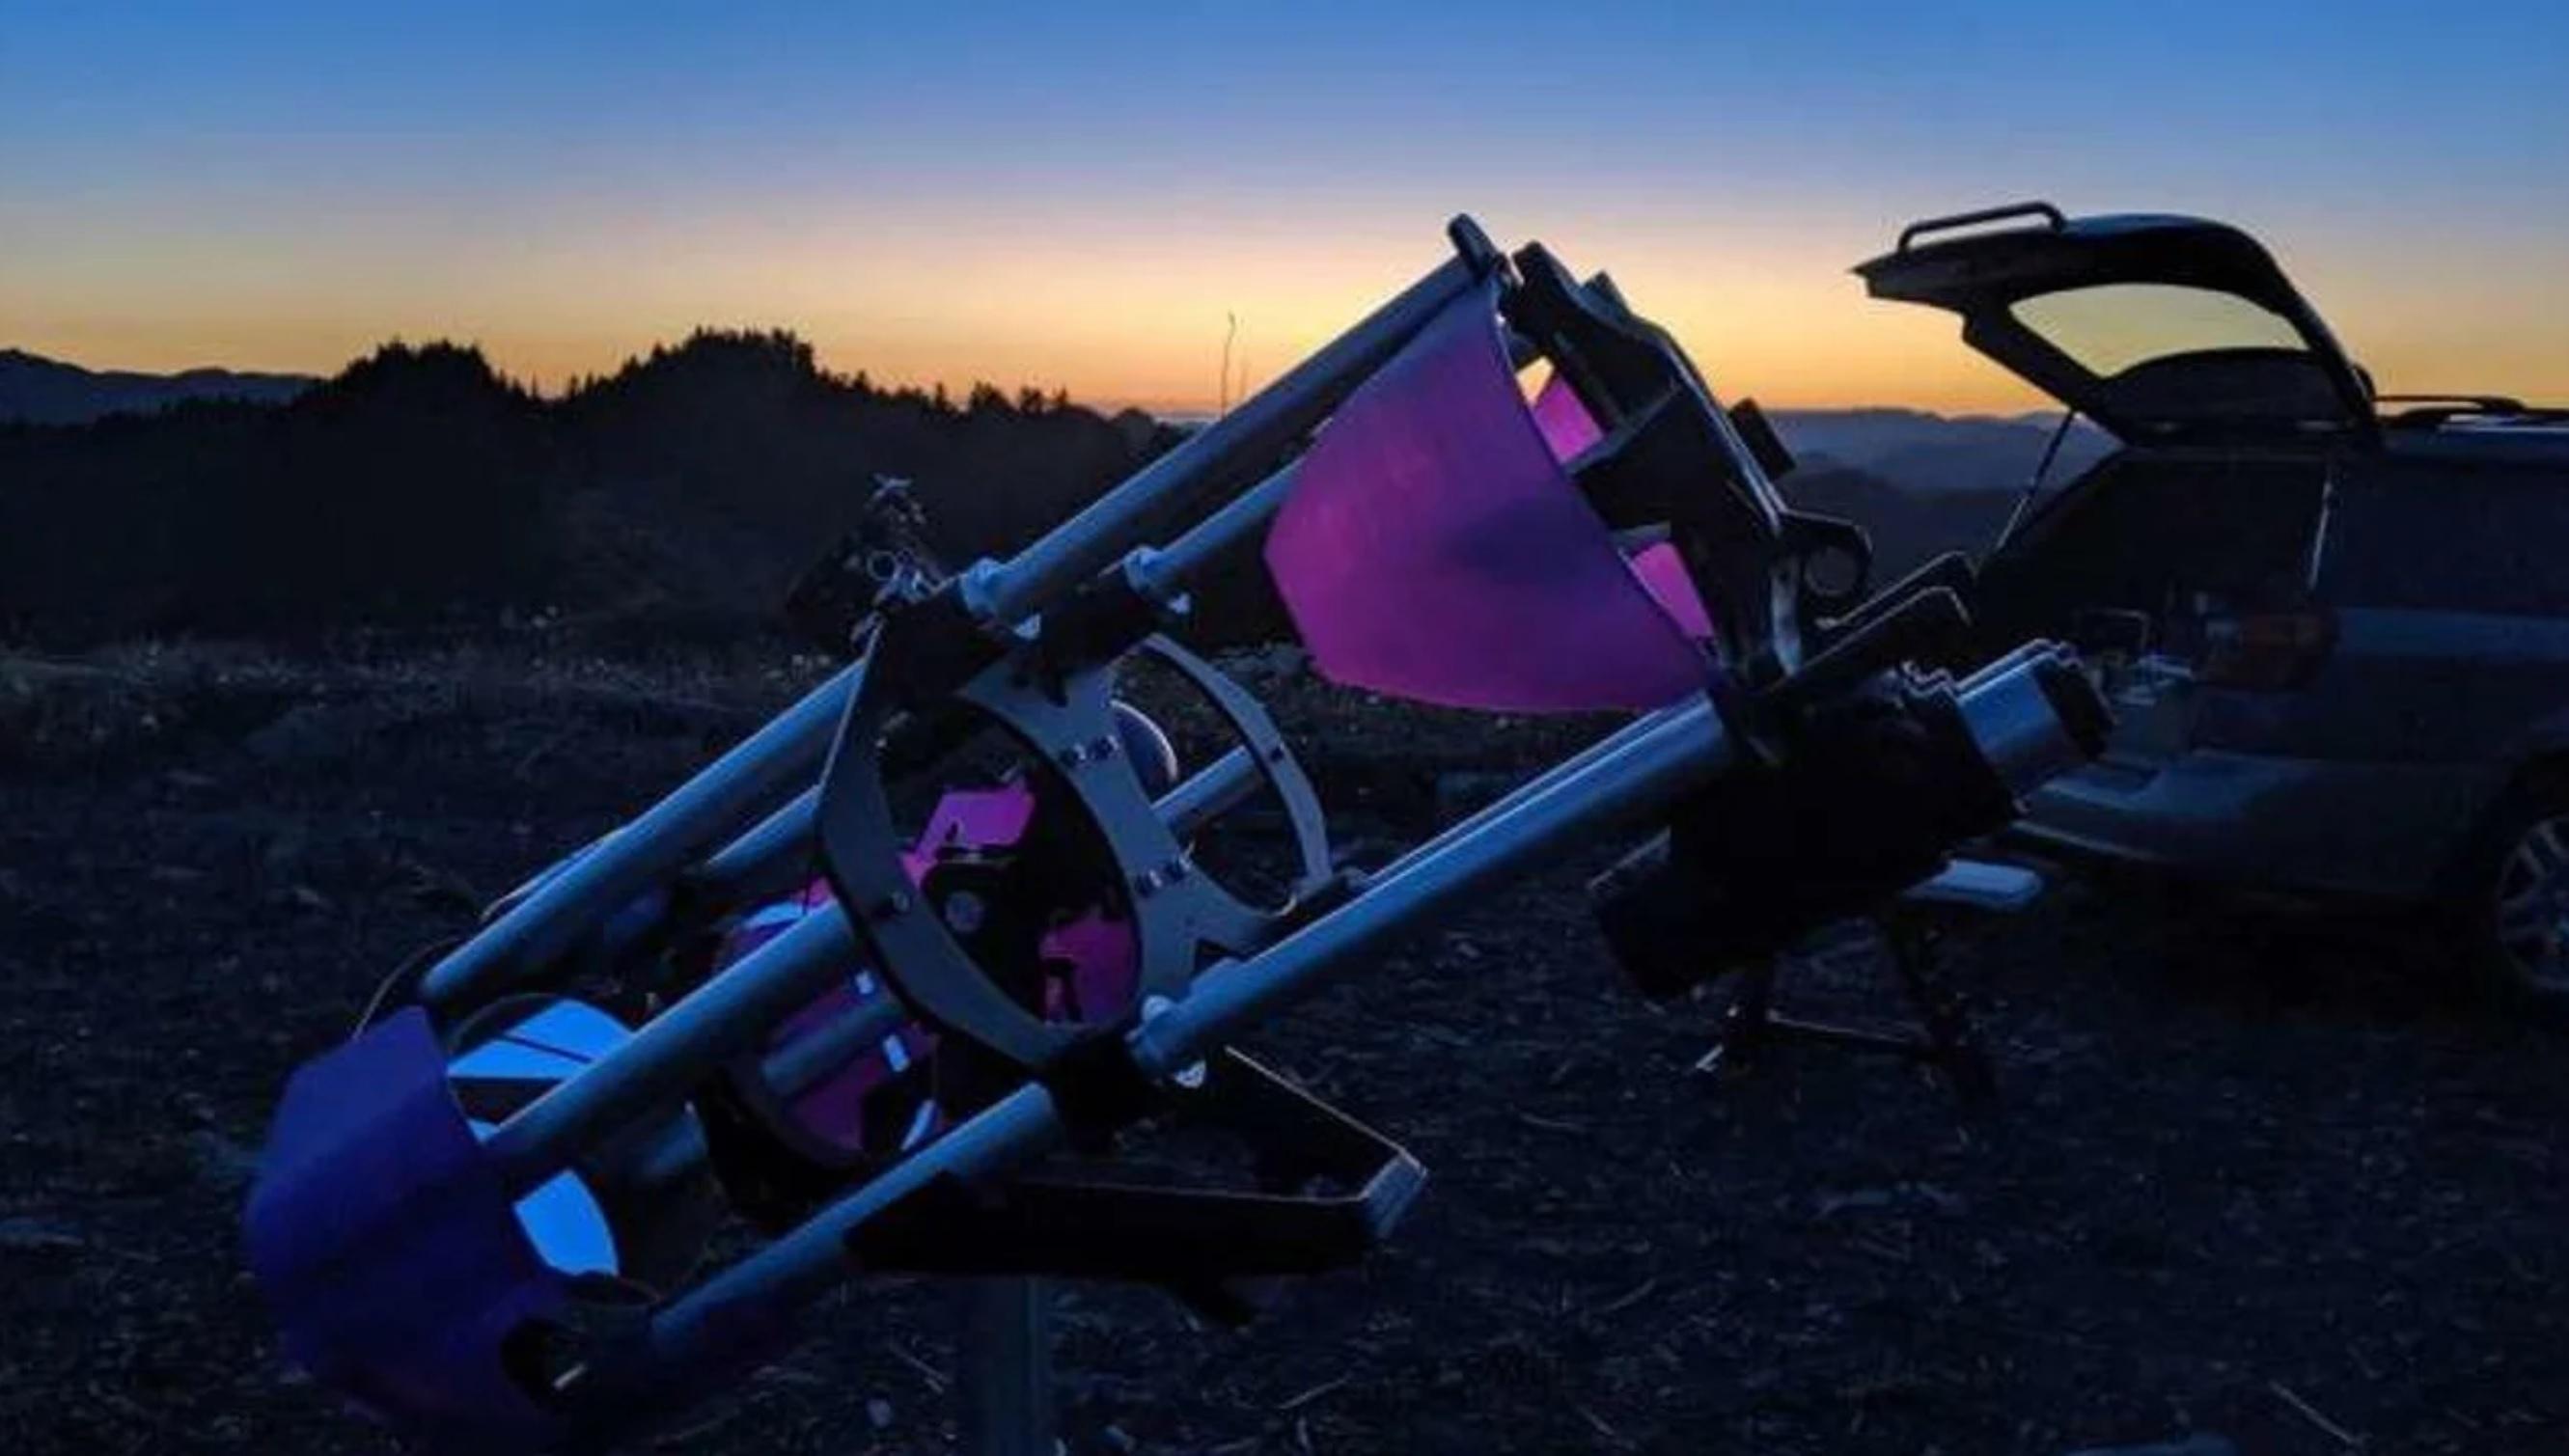 سفارش پرینت سه بعدی تلسکوپ